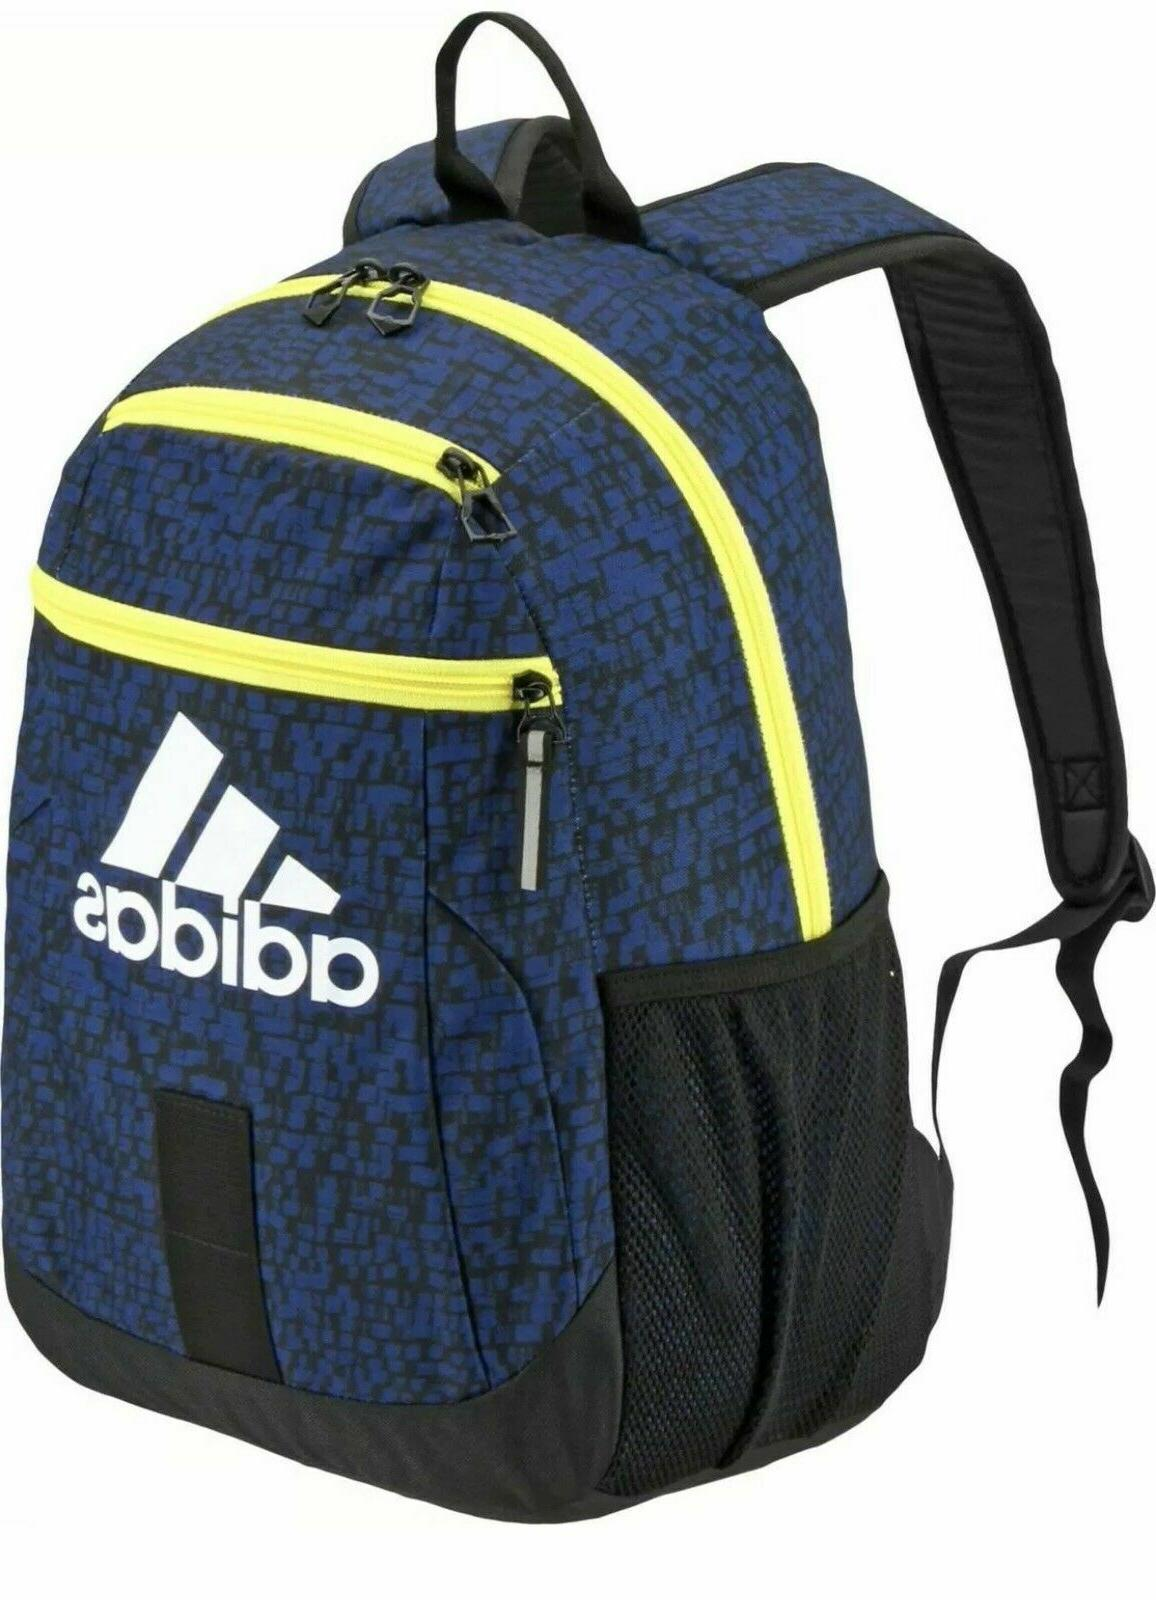 ADIDAS YOUTH Creator School Laptop Backpack HYDRATION MEDIA